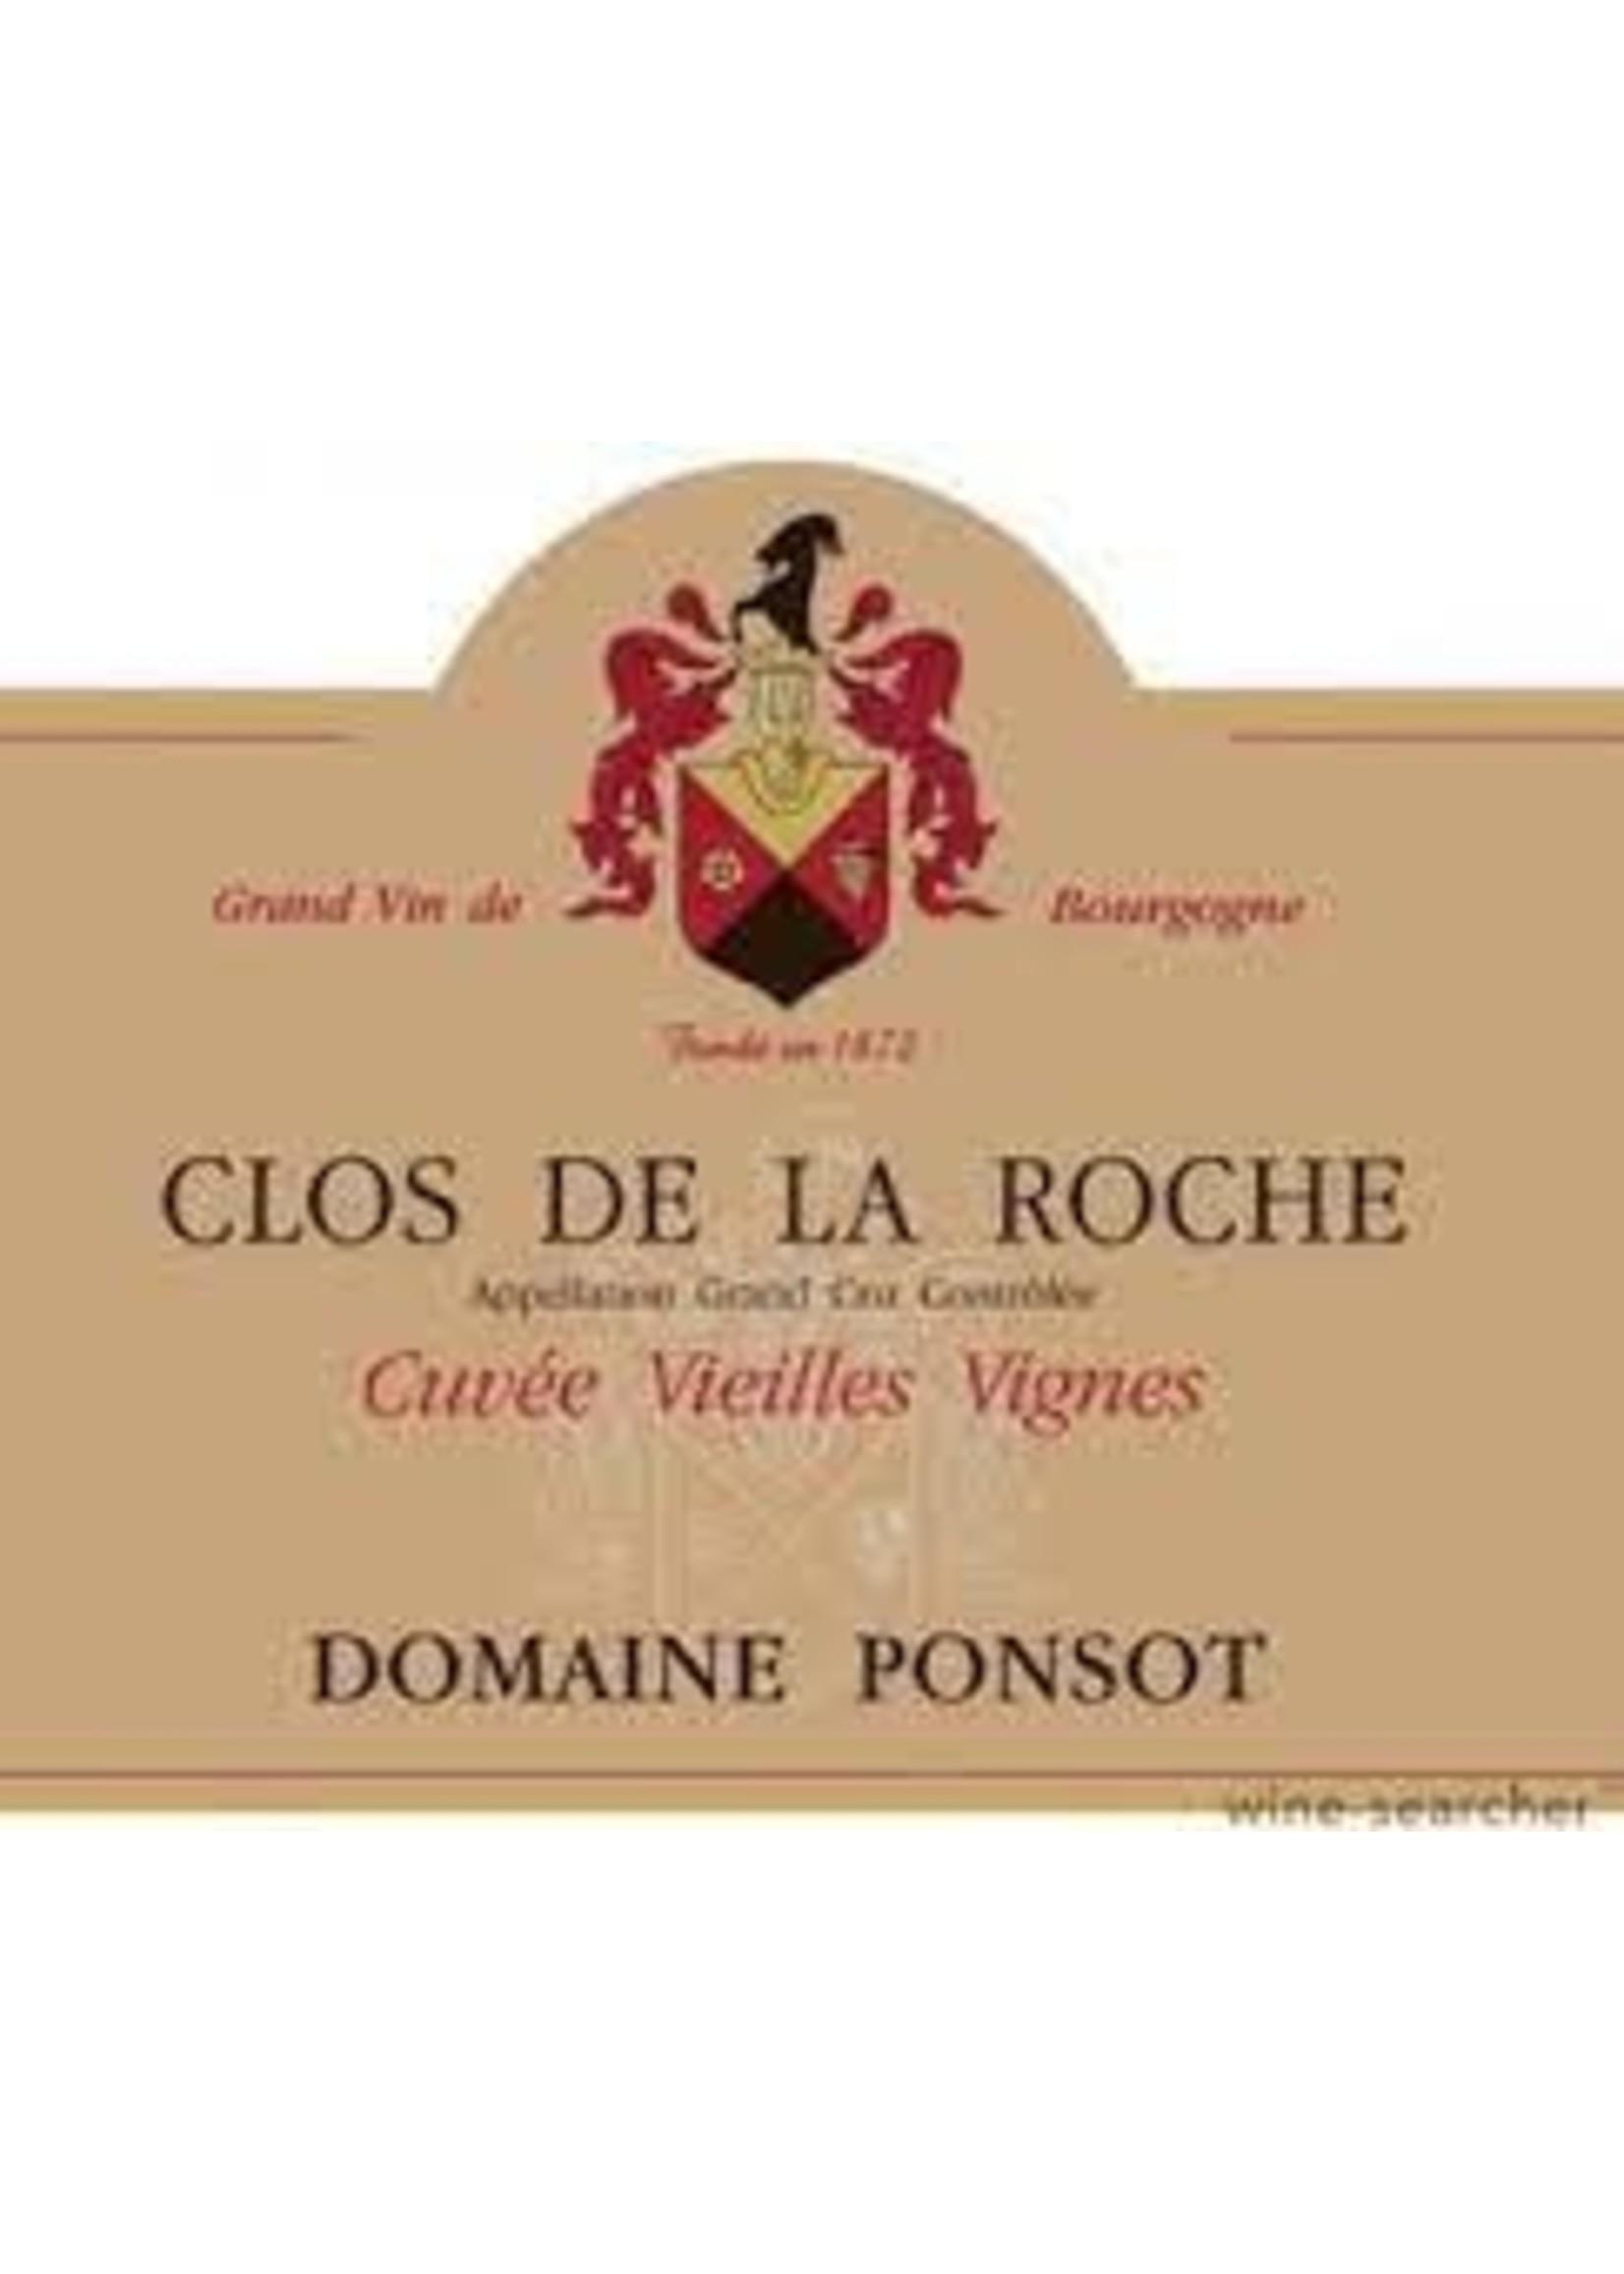 Domaine Ponsot 2003 Clos de la Roche Vieilles Vignes Grand Cru 1.5L [PRE-ARRIVAL]